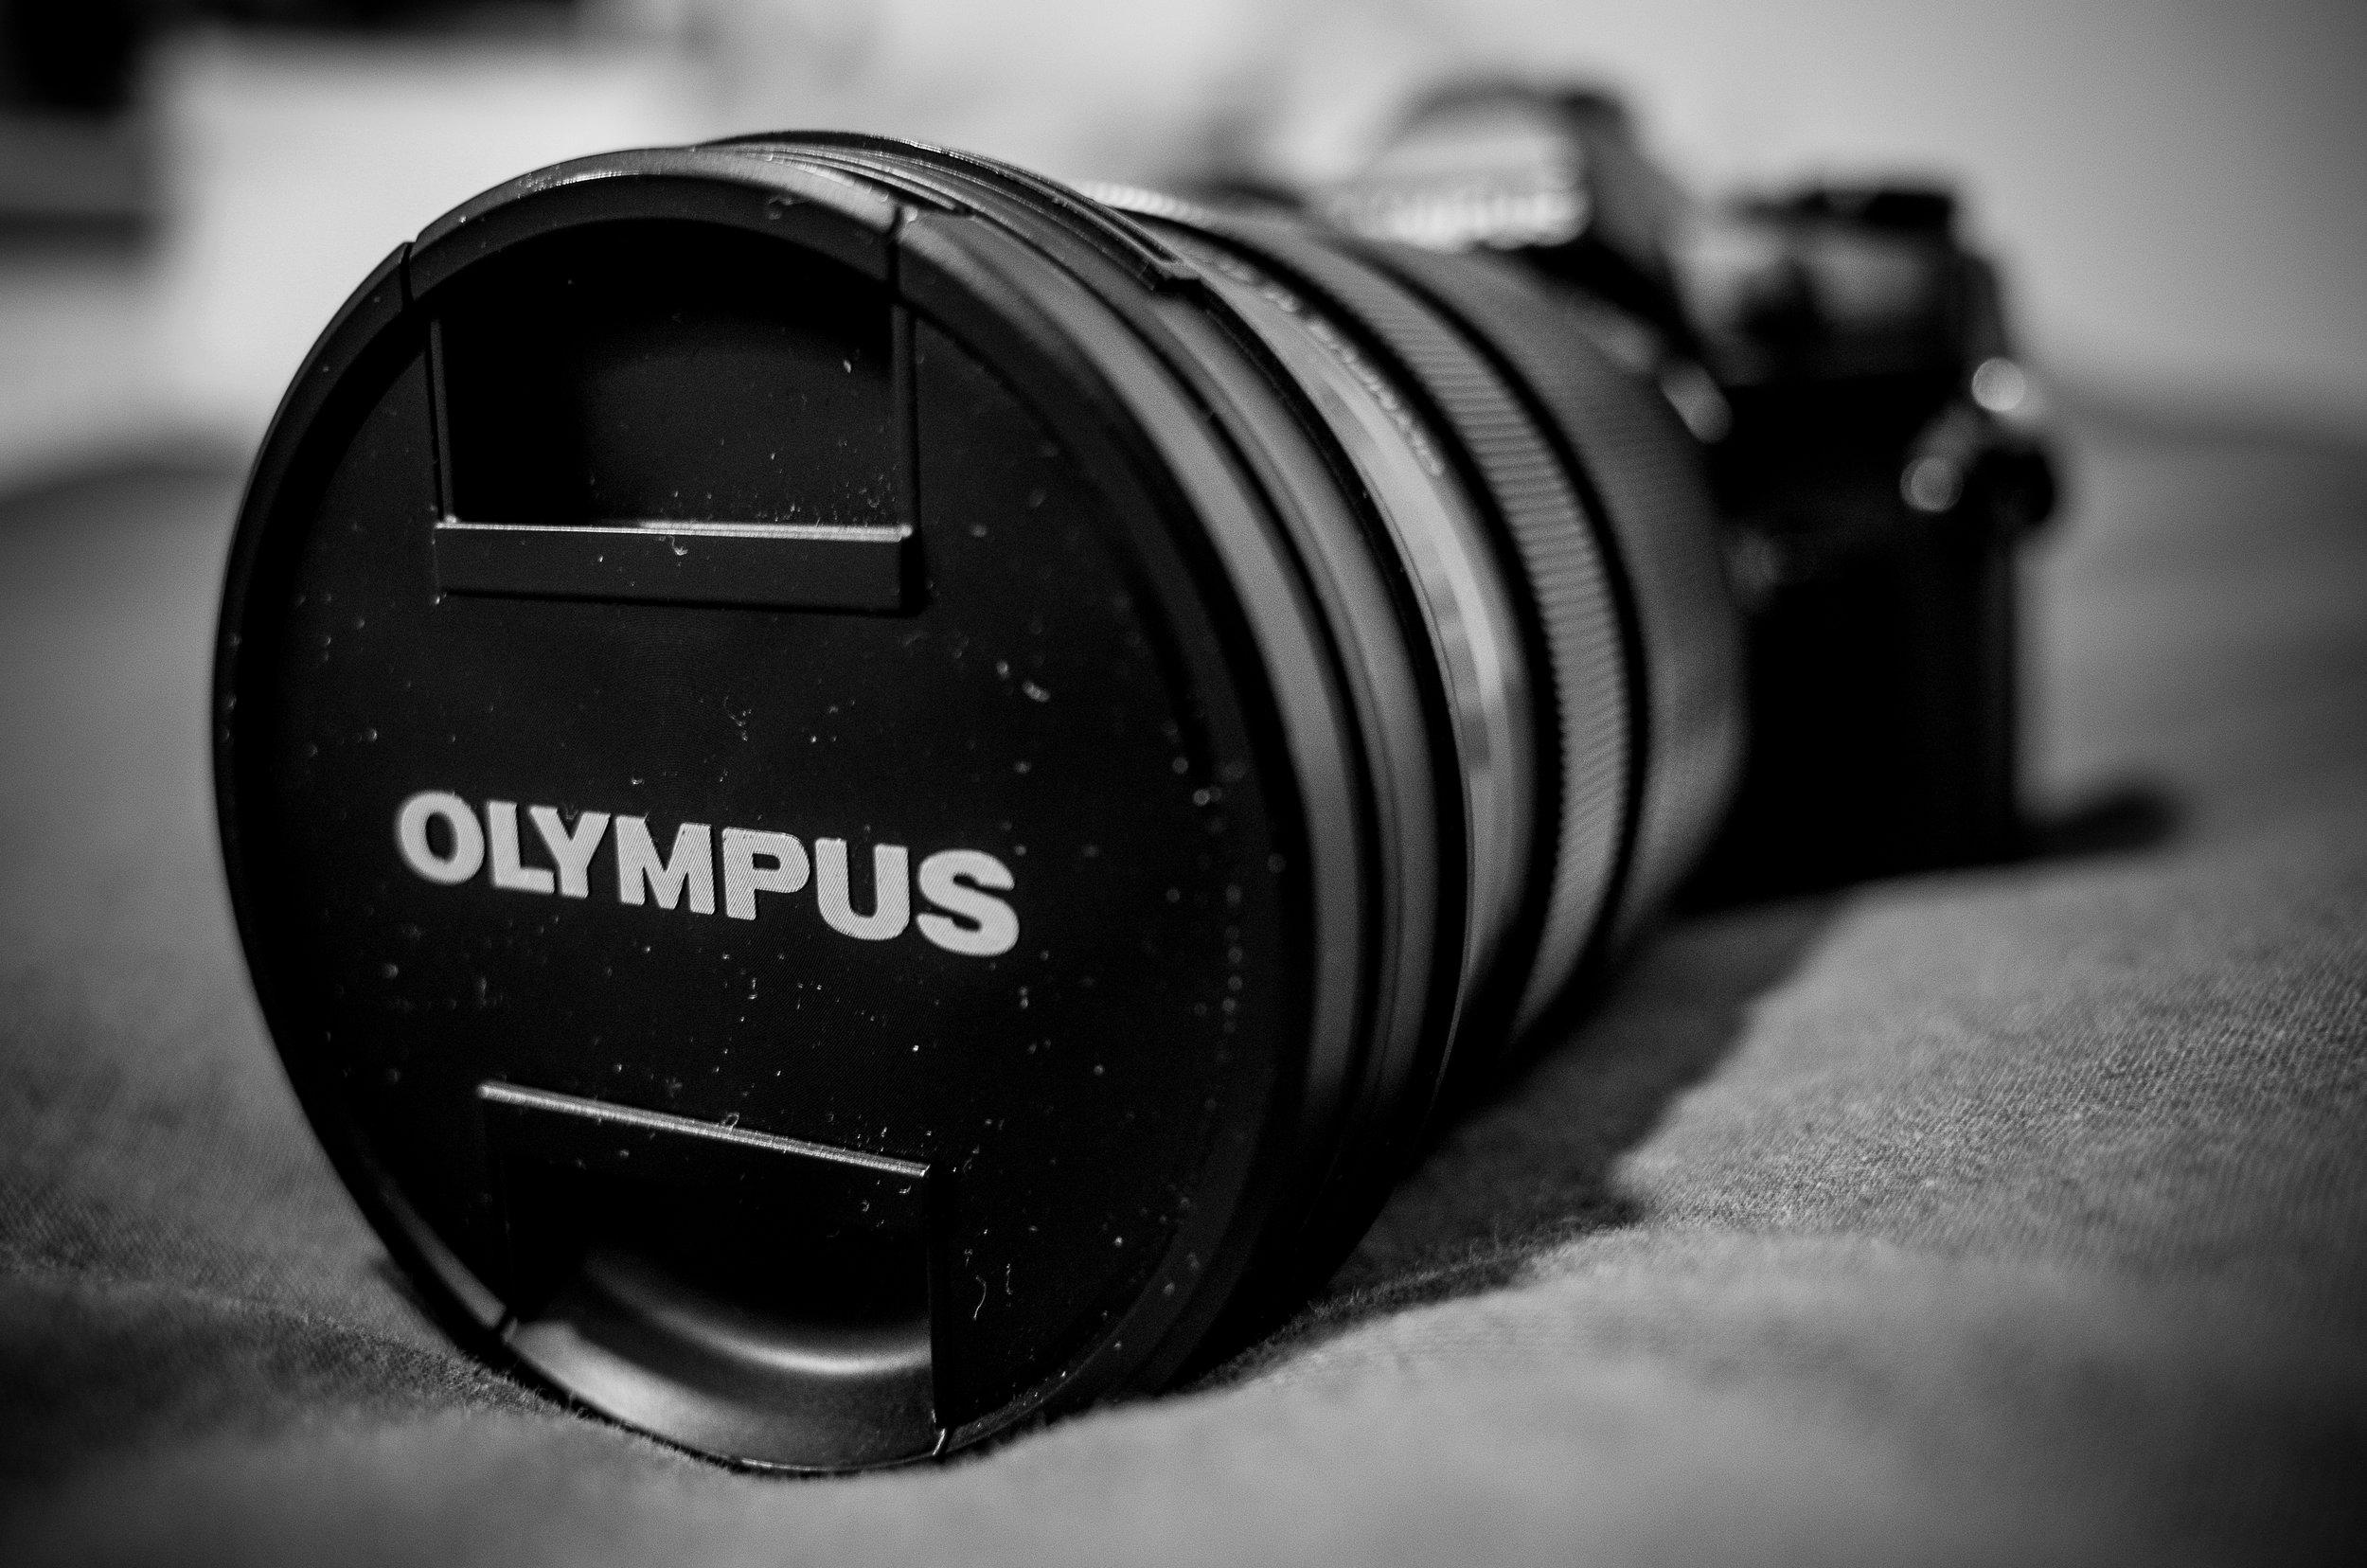 Olympus OM-D EM-1 MKII with M.Zuiko 12-100mm F4 IS PRO